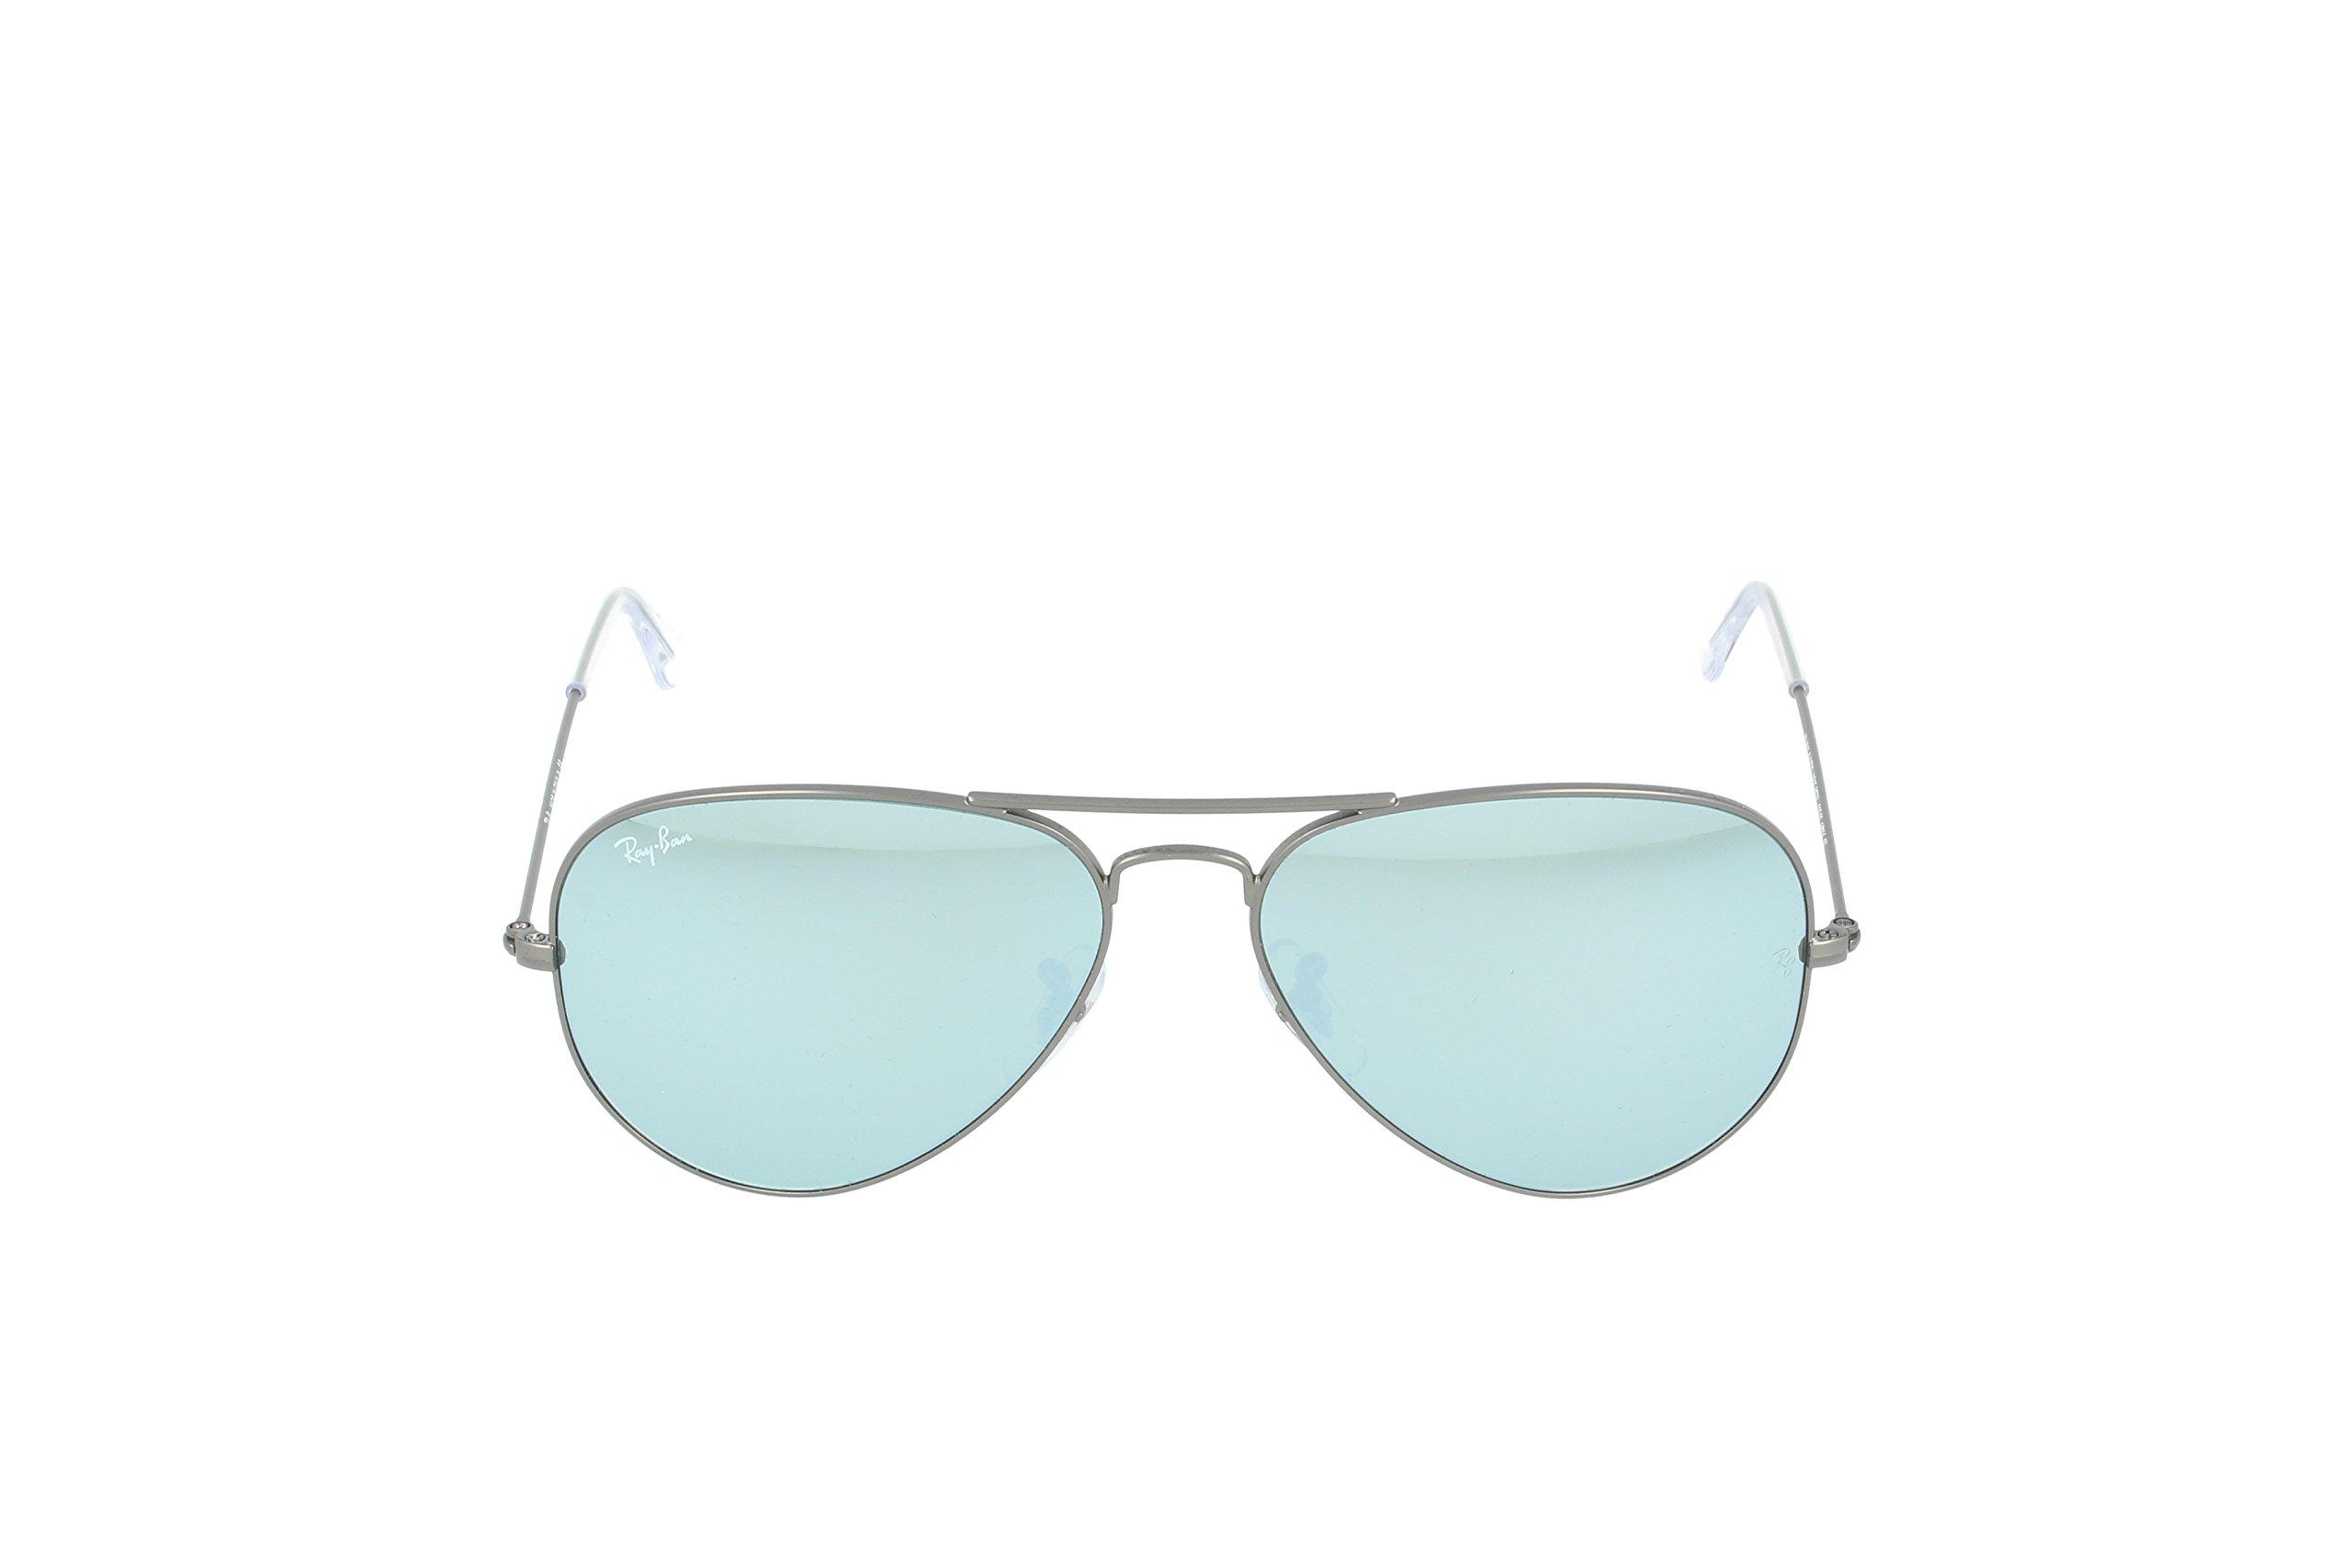 Ray-Ban 3025 Aviator Large Metal Mirrored Non-Polarized Sunglasses, Gunmetal/Silver Flash (029/30), 58 mm by Ray-Ban (Image #2)